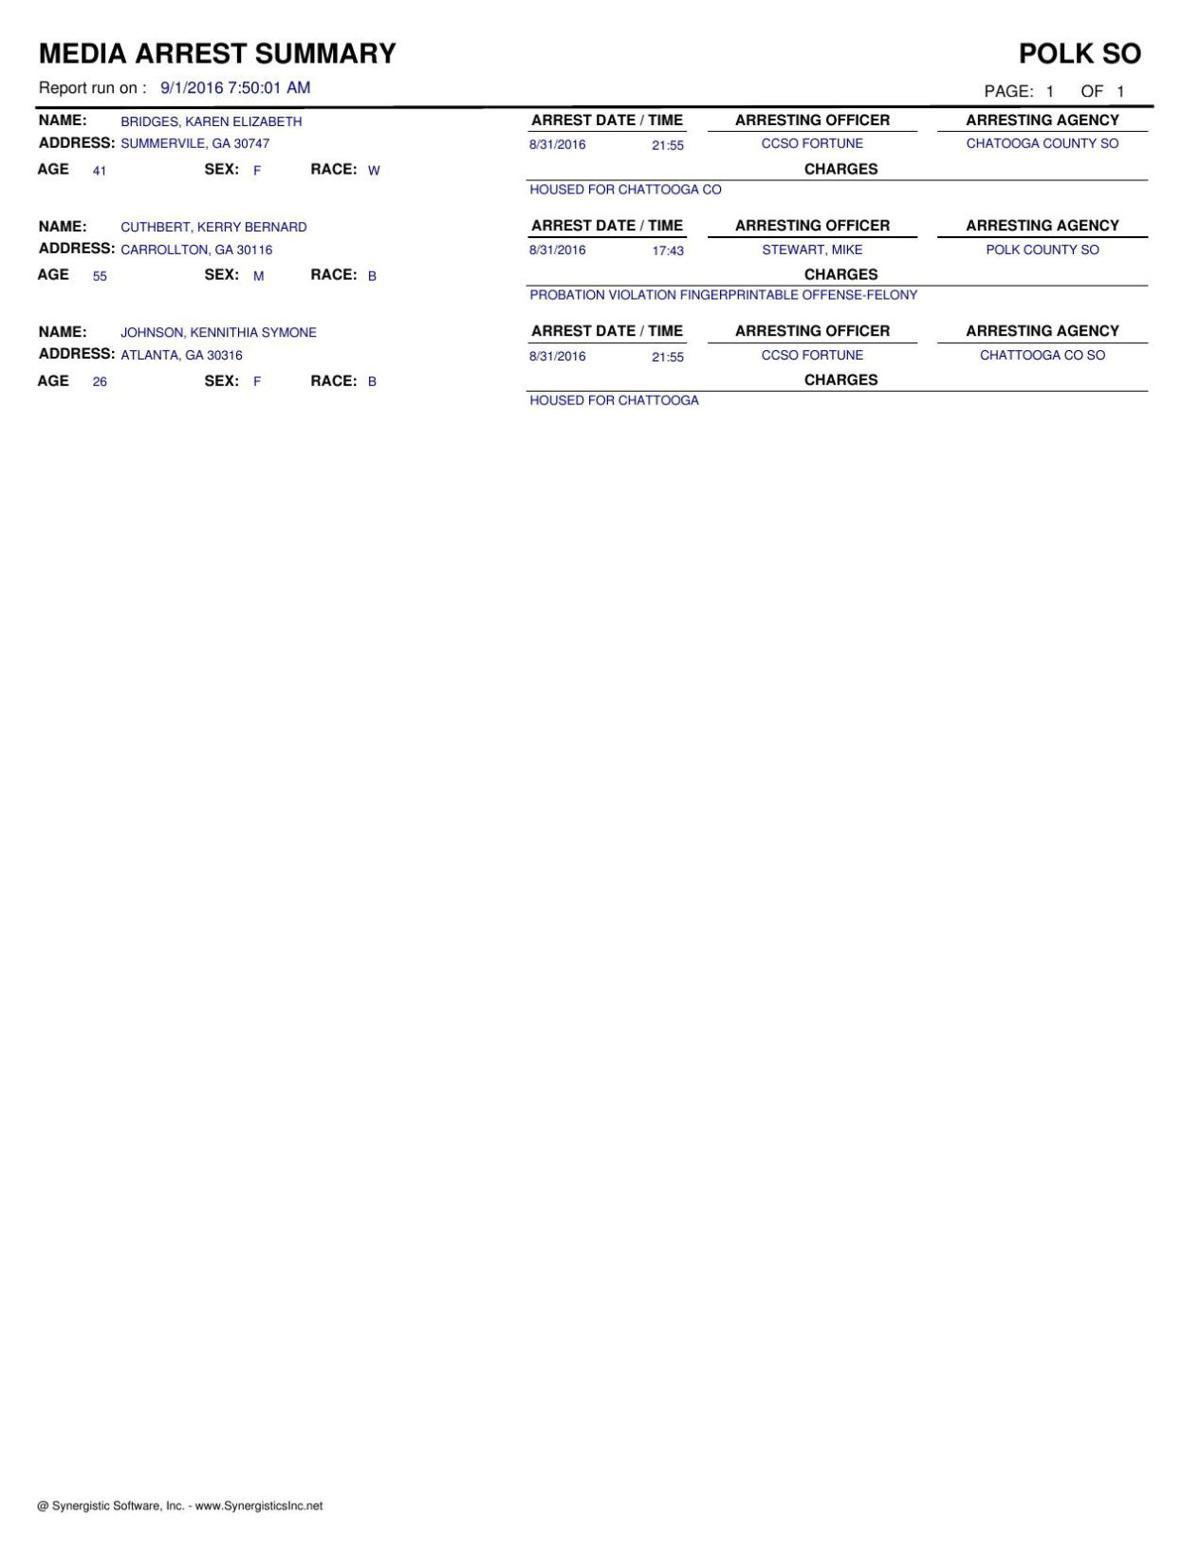 Polk arrest document dated January 21, 2015